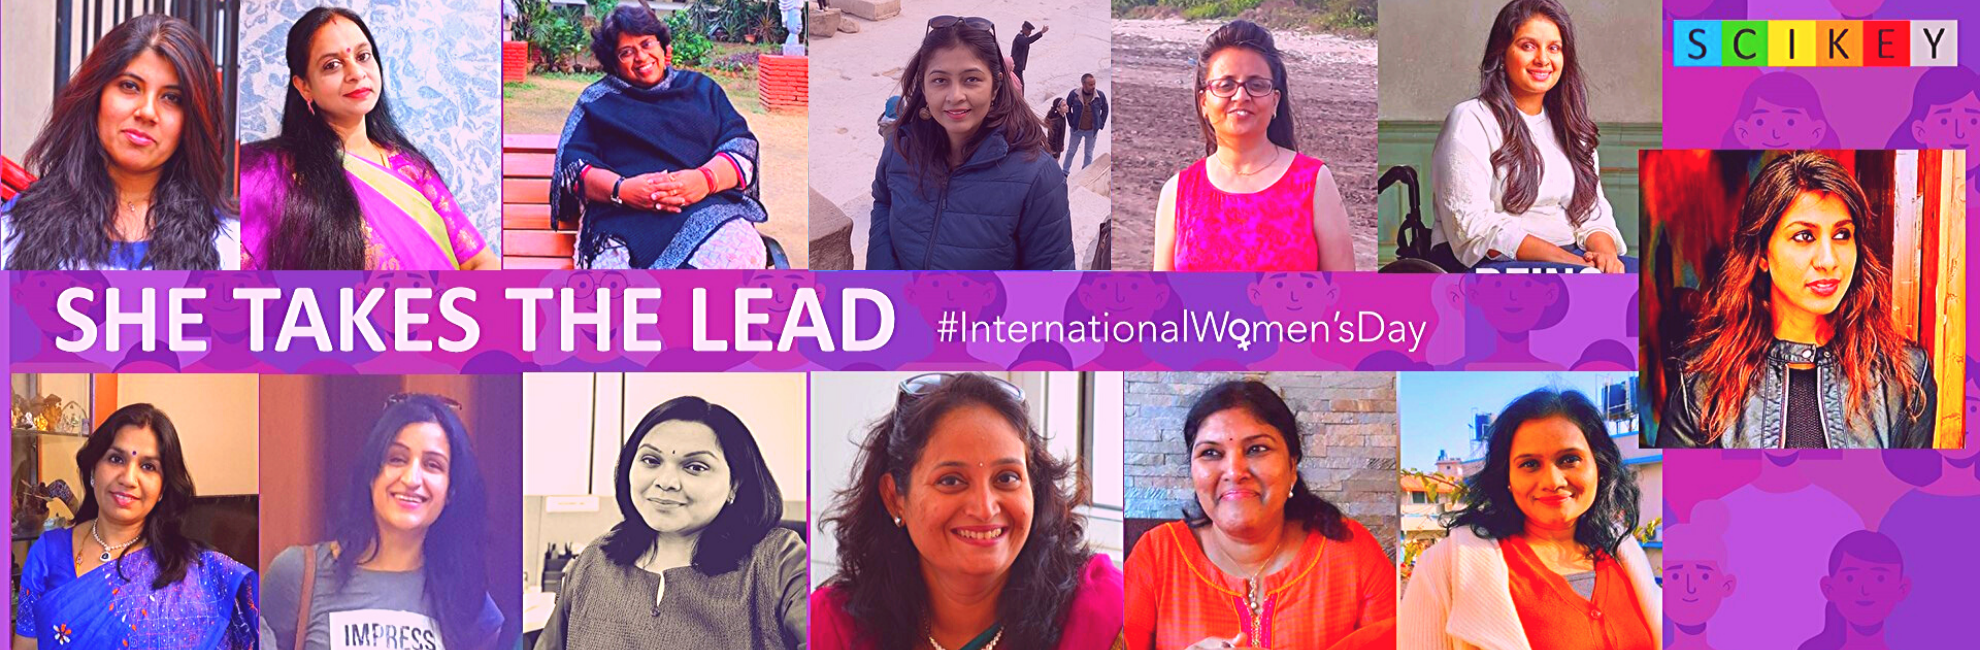 Karunjit Kumar Dhir on LinkedIn: She Takes The Lead | 11 comments